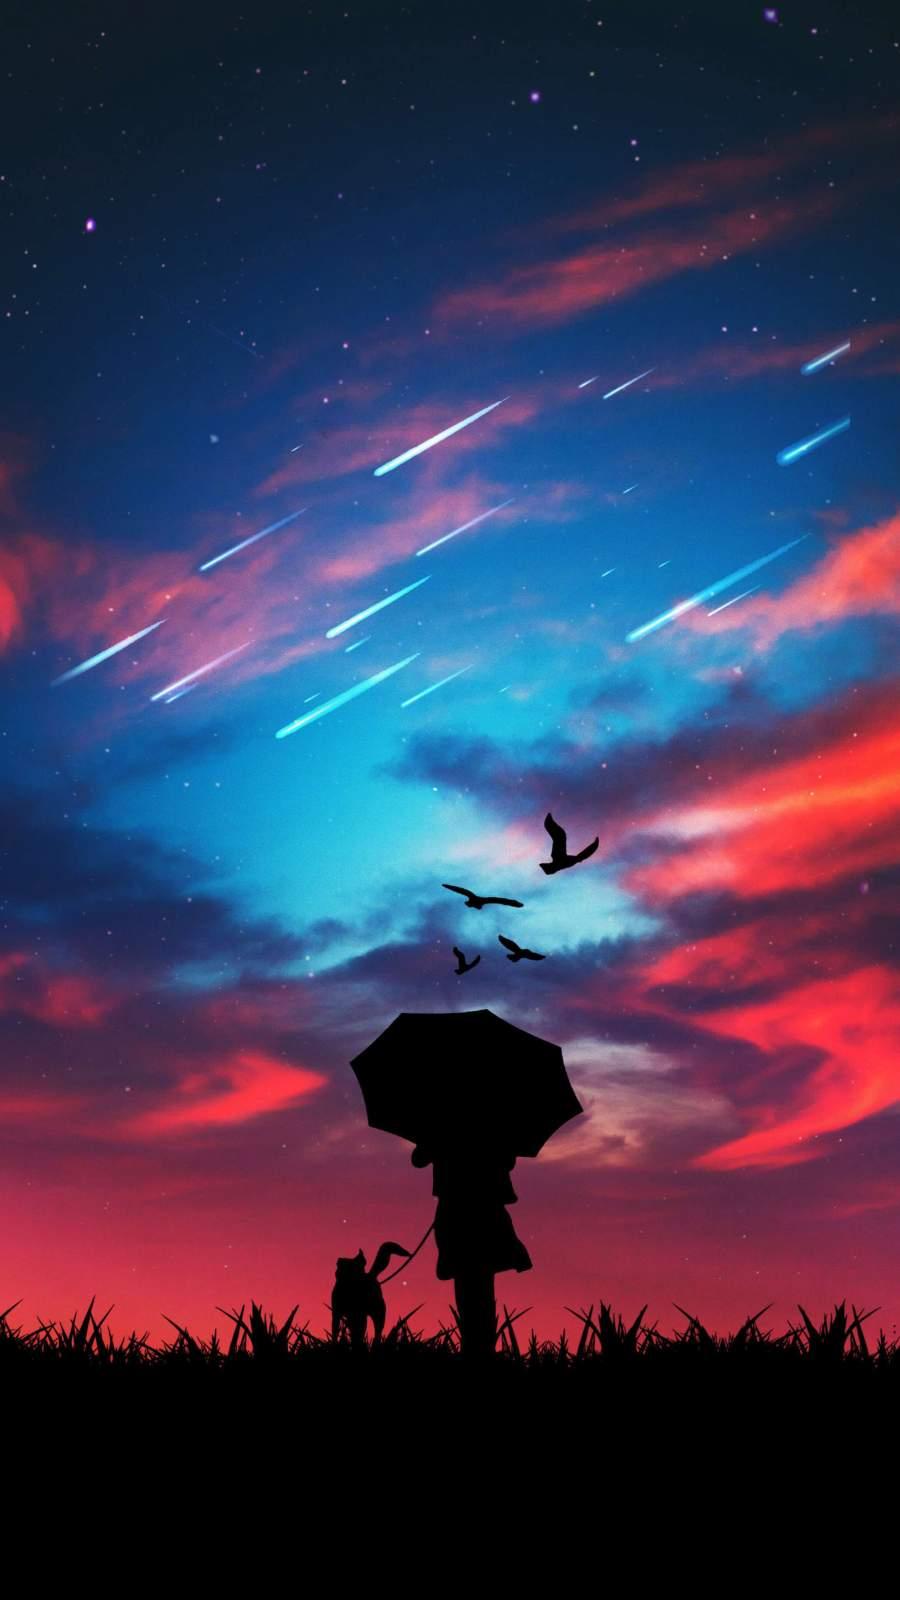 Sunset Dreams iPhone Wallpaper